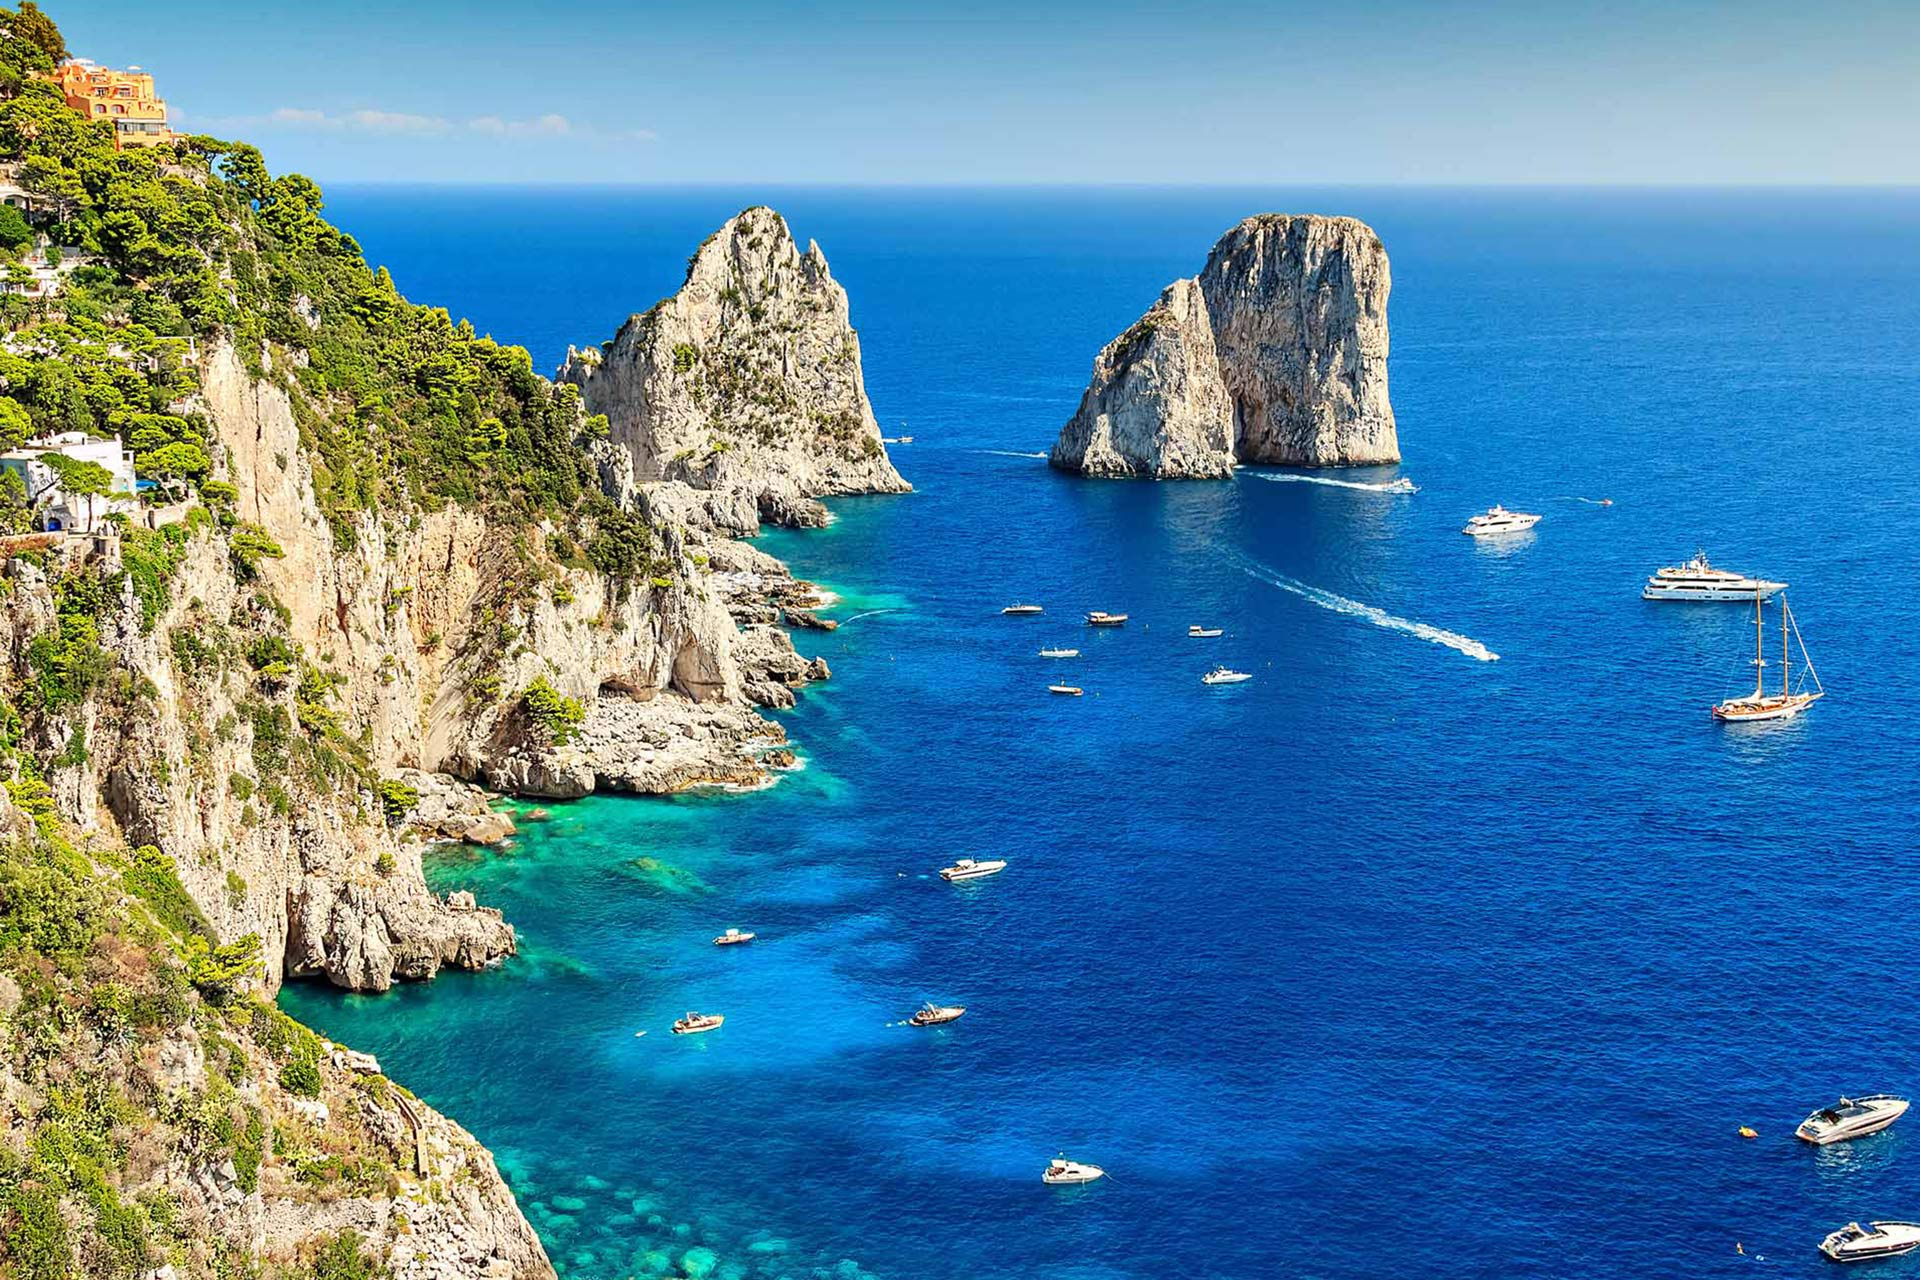 rental-boat-tour-capri-amalfi-positano-sorrento